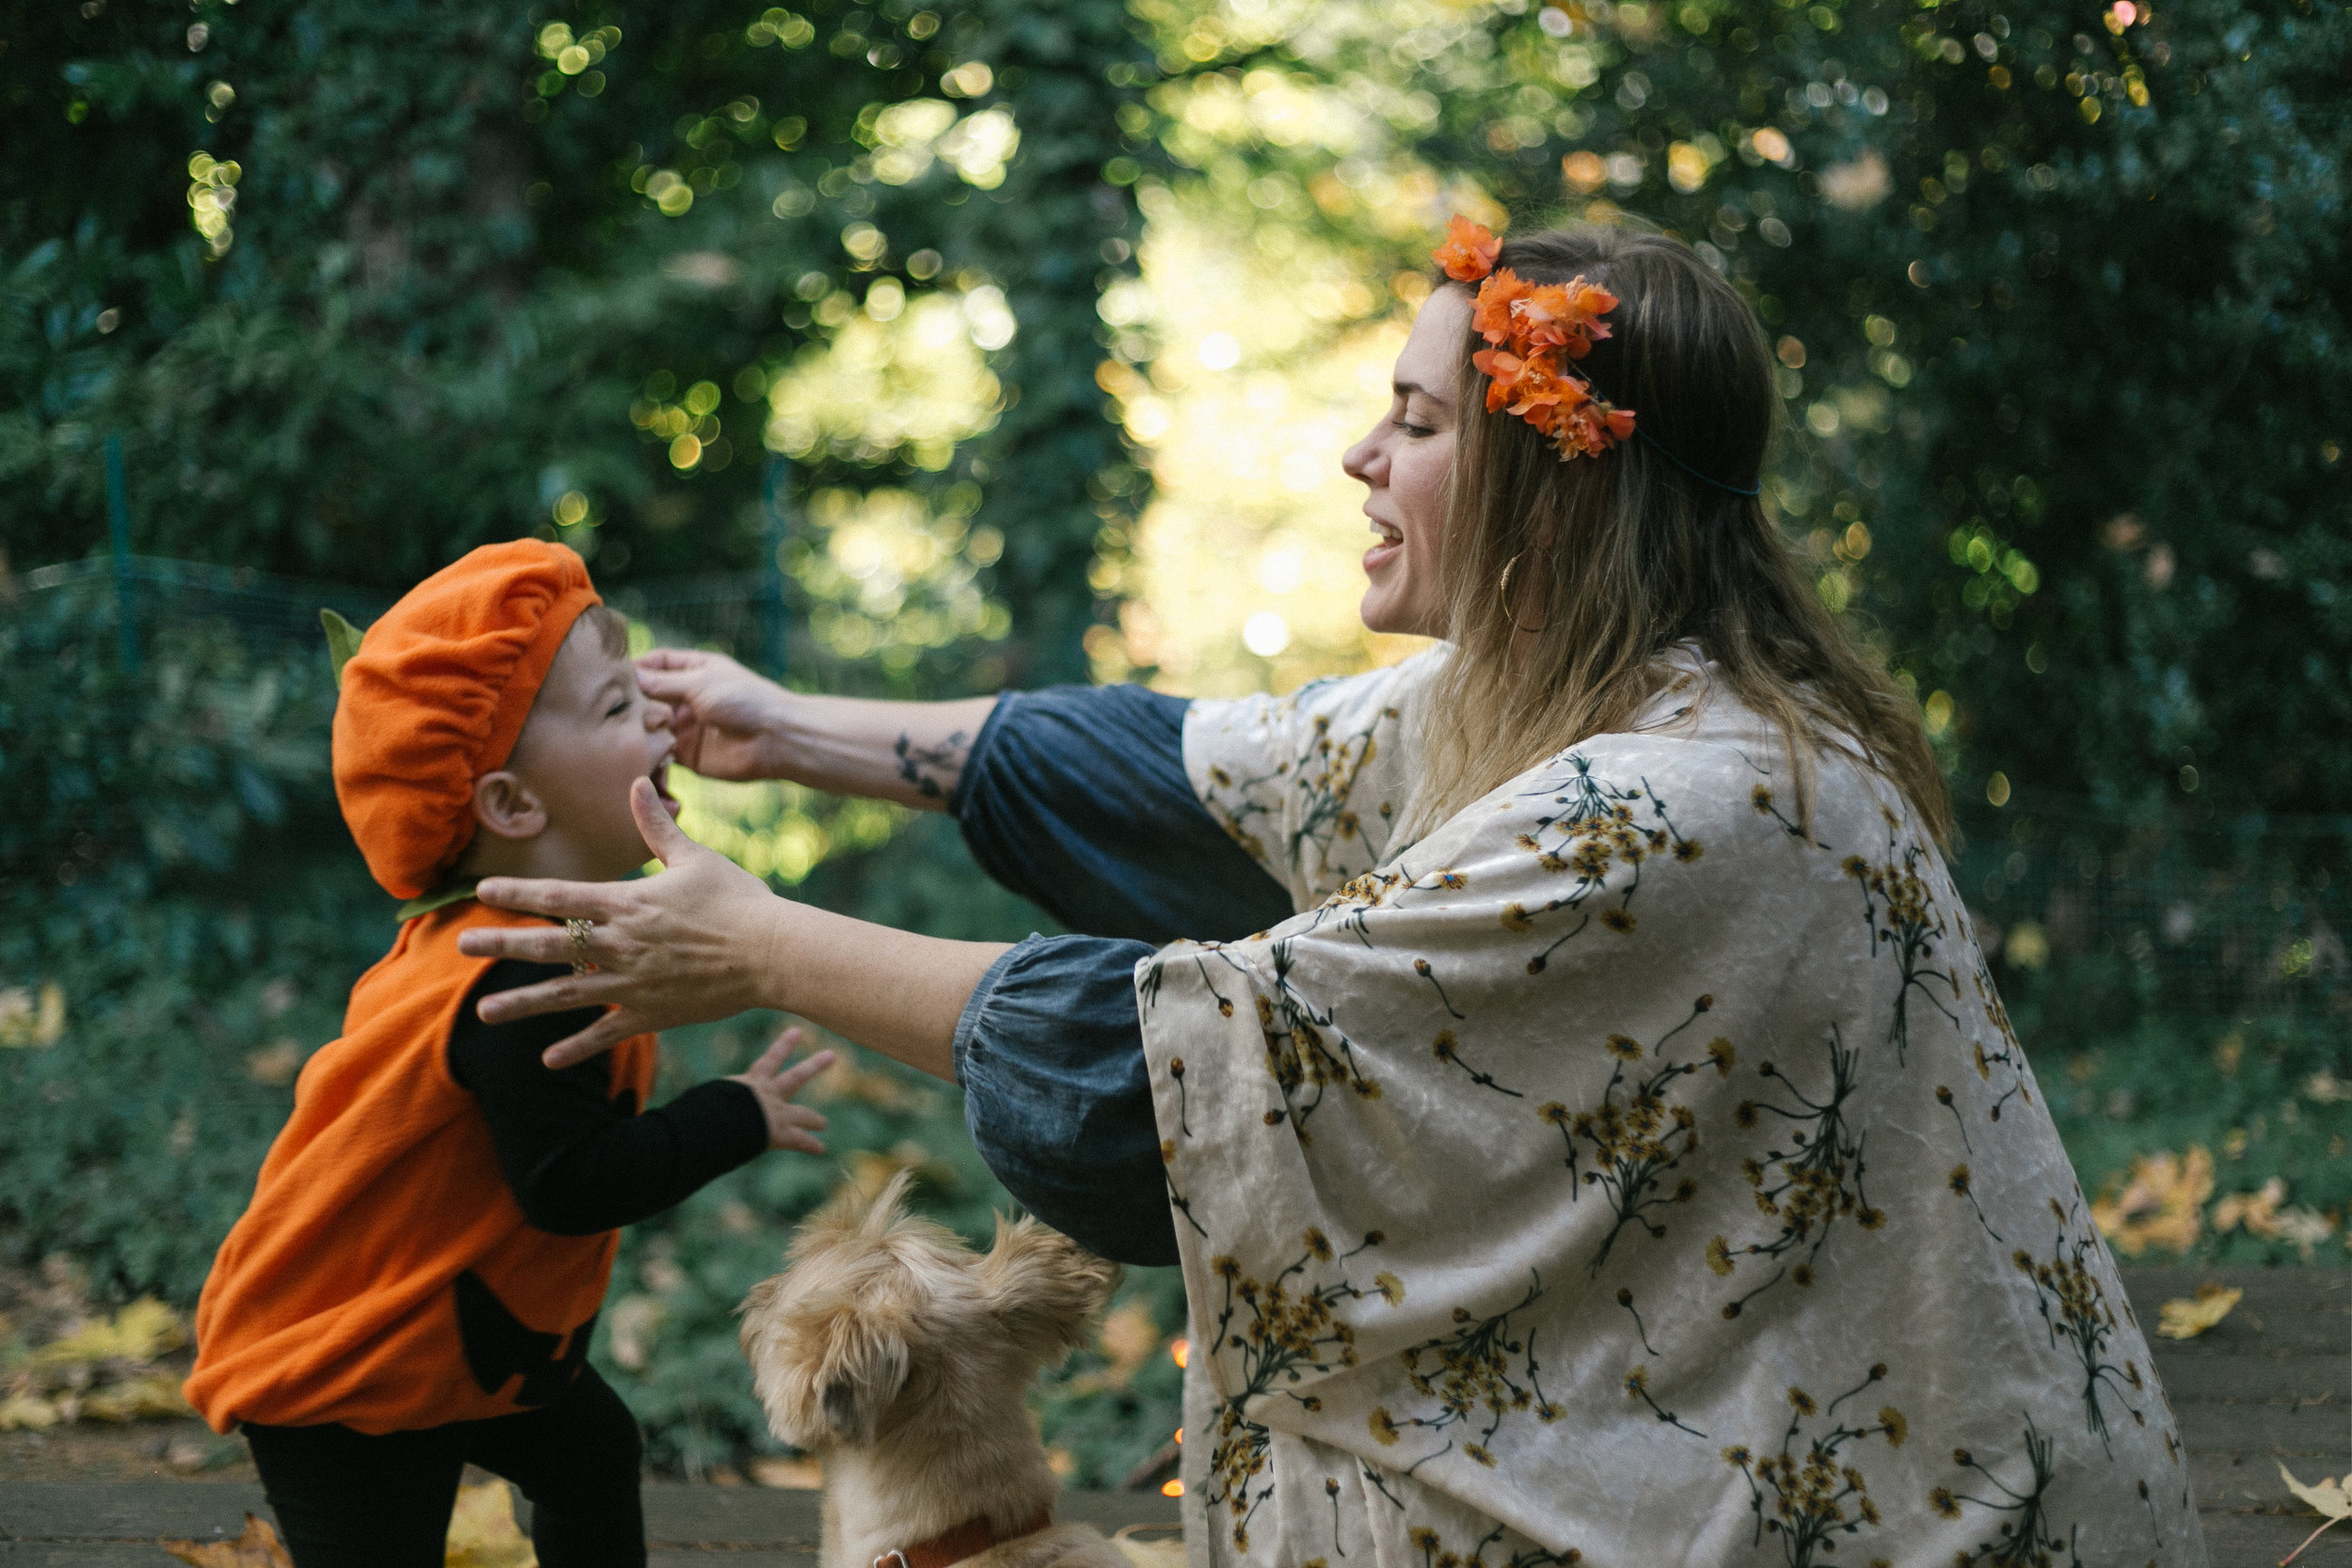 Halloween Kid Portraits at Home | Chelsea Macor Photography-12.jpg